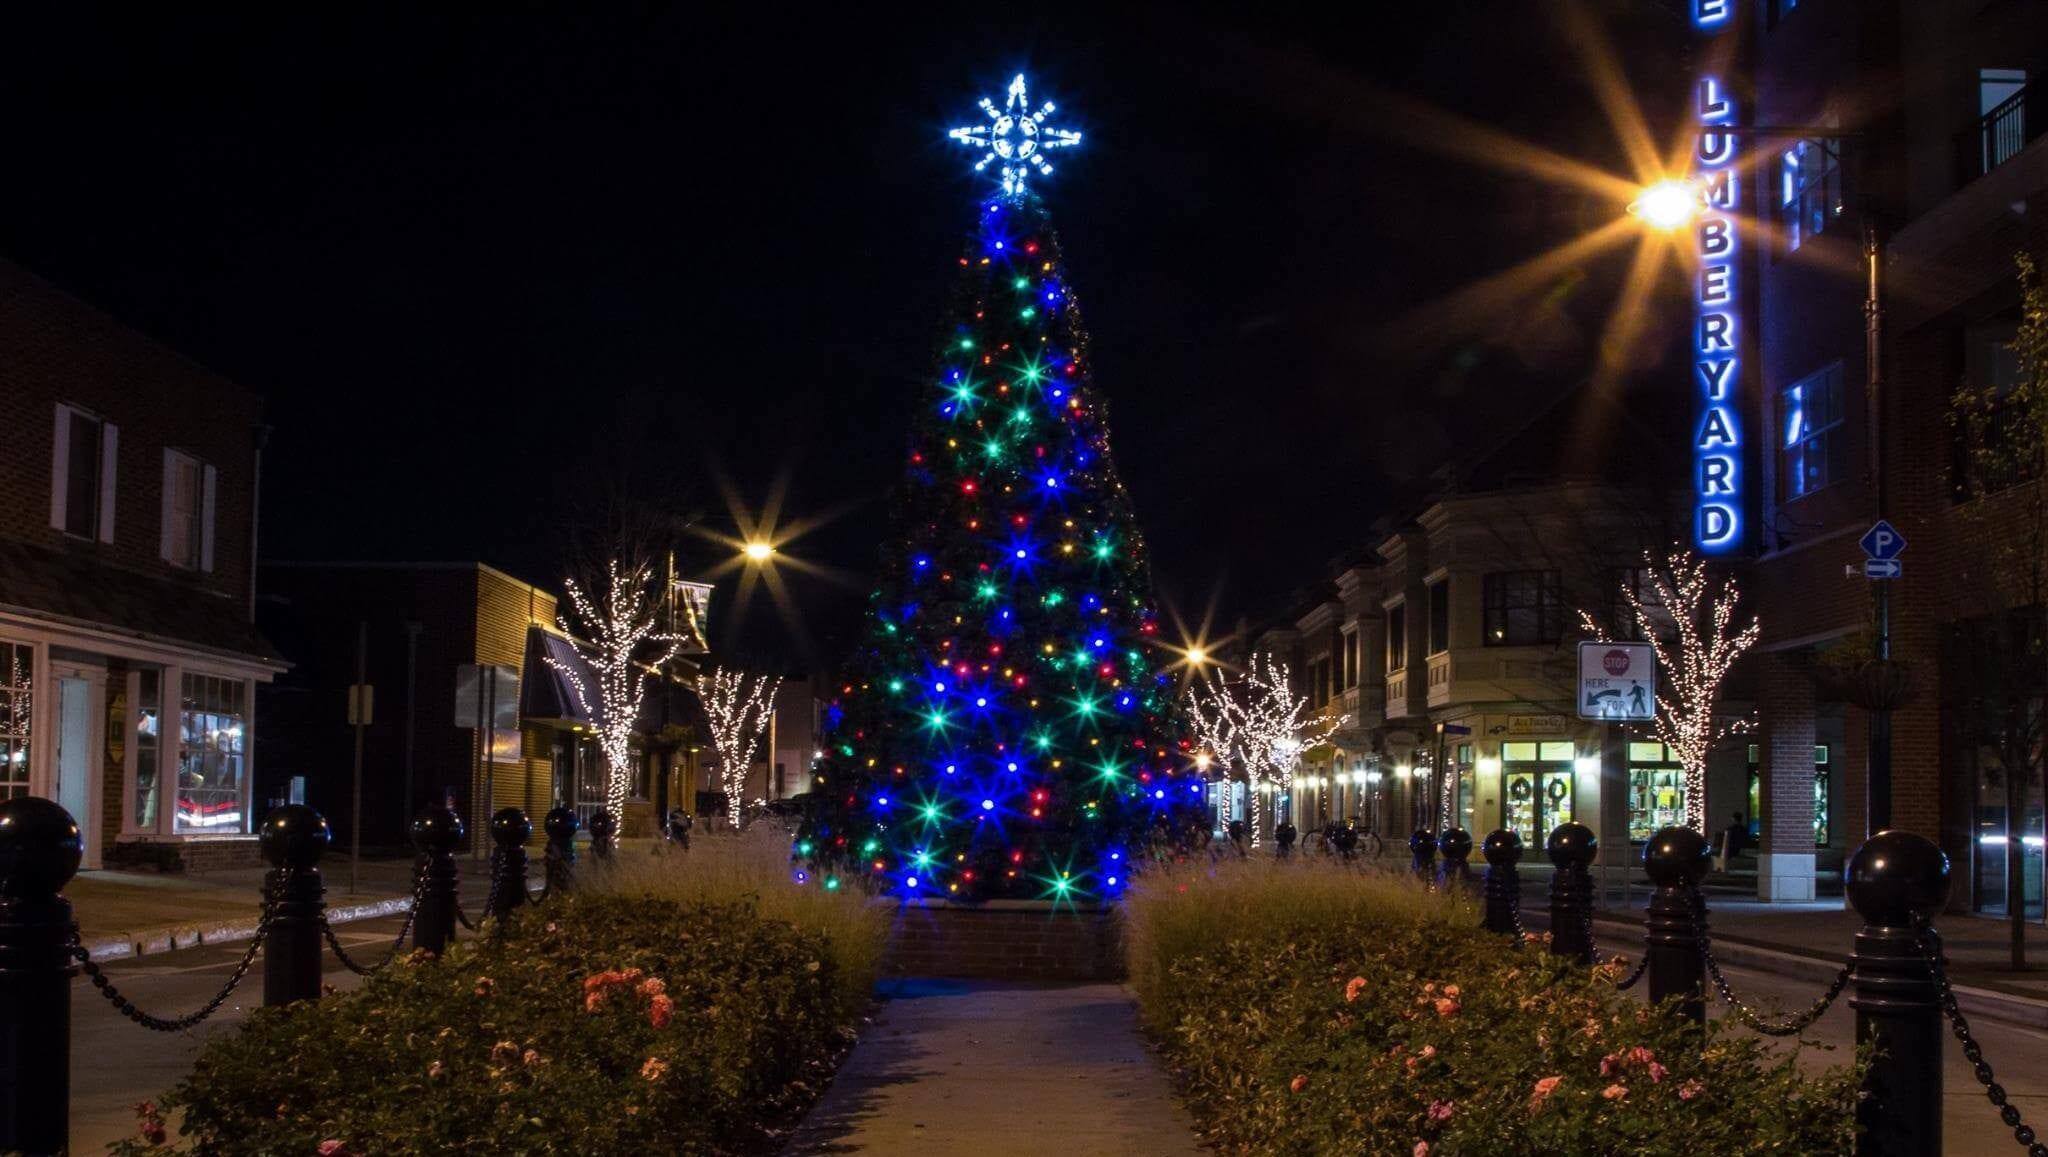 When Is Bridgeton New Jersey Christmas Parade 2020 New Jersey Christmas Tree Lightings and Parades December 2019